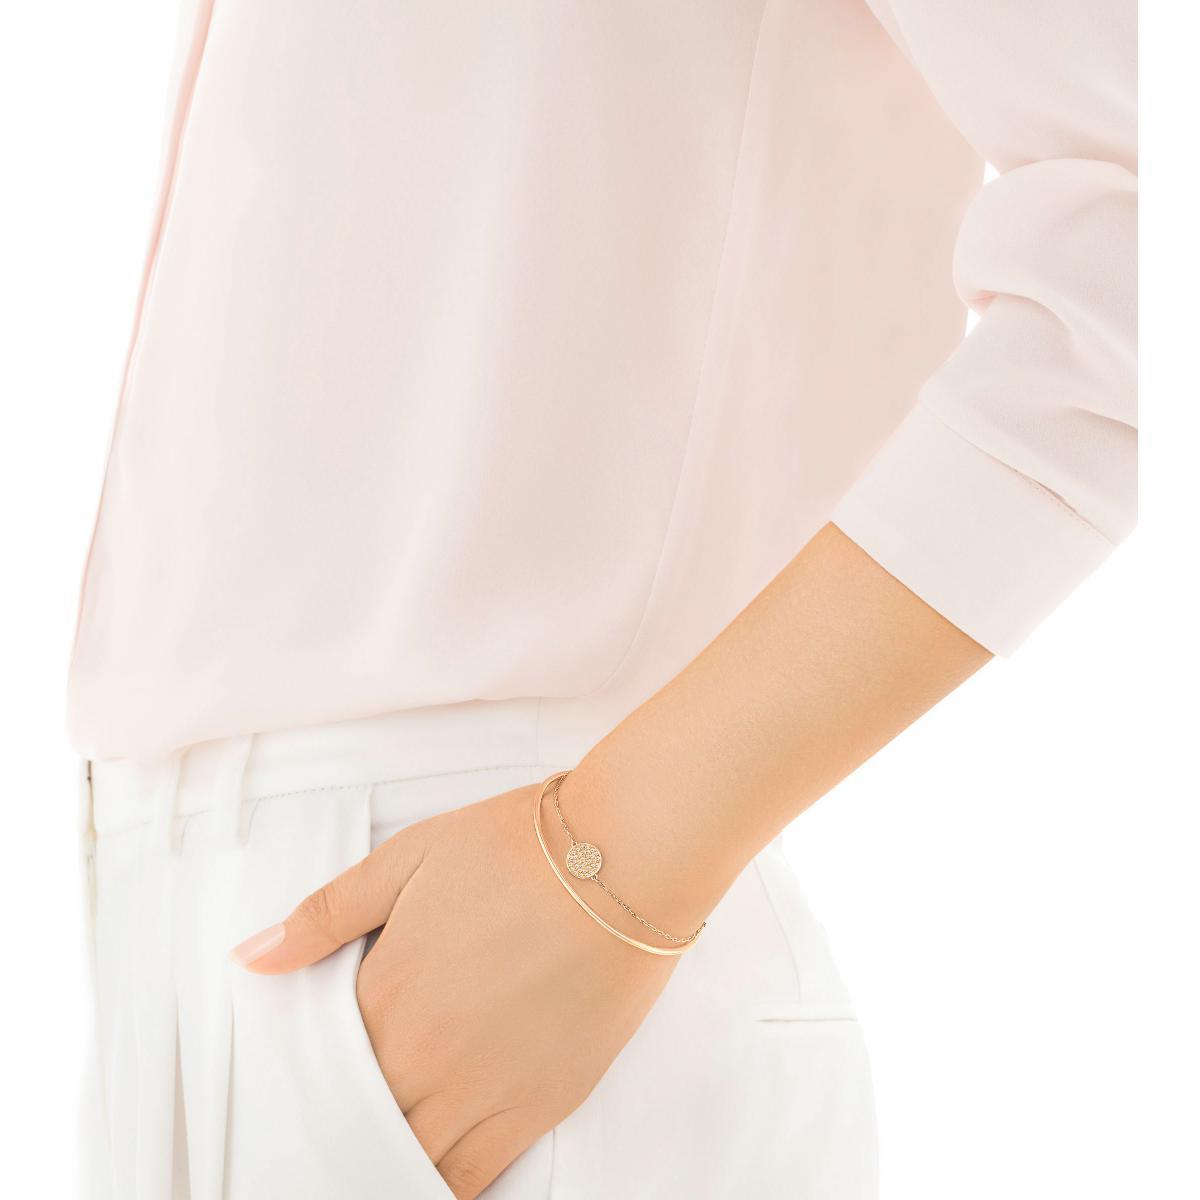 Bracelet Swarovski Bijoux 5274892 - Or Rose Cristaux Femme